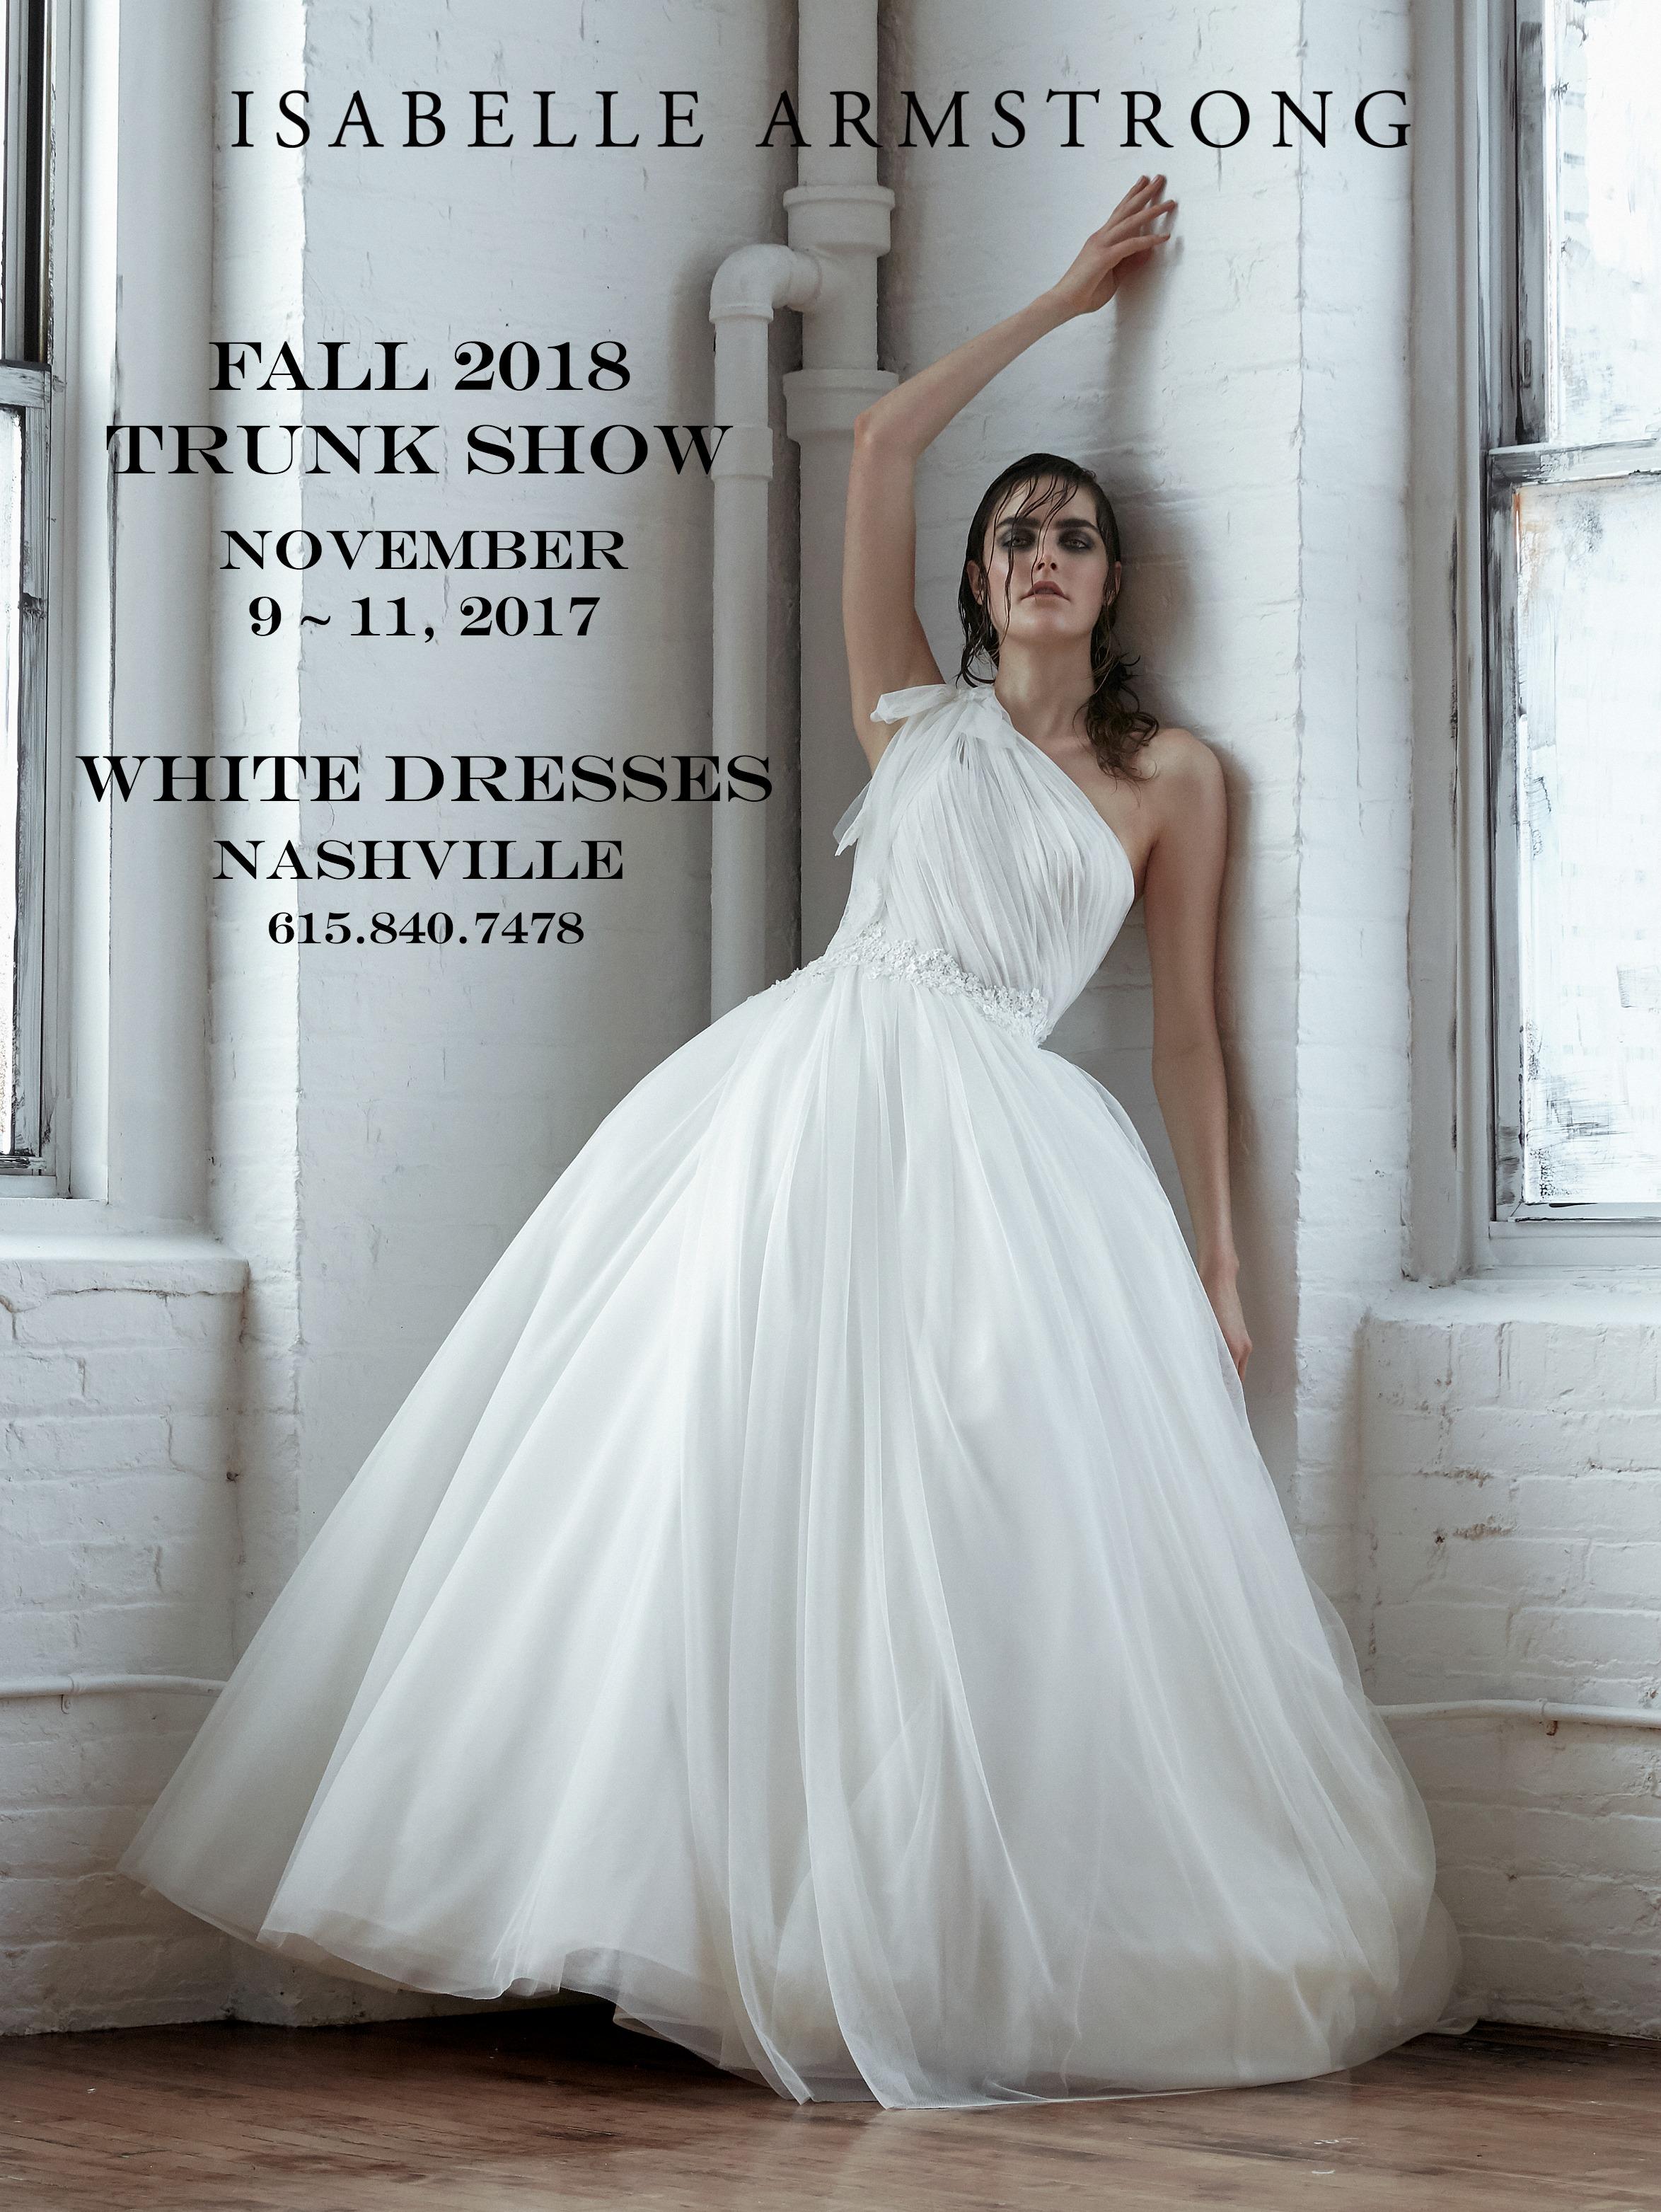 IA-WHITE DRESSES TS 10-9-17.jpg